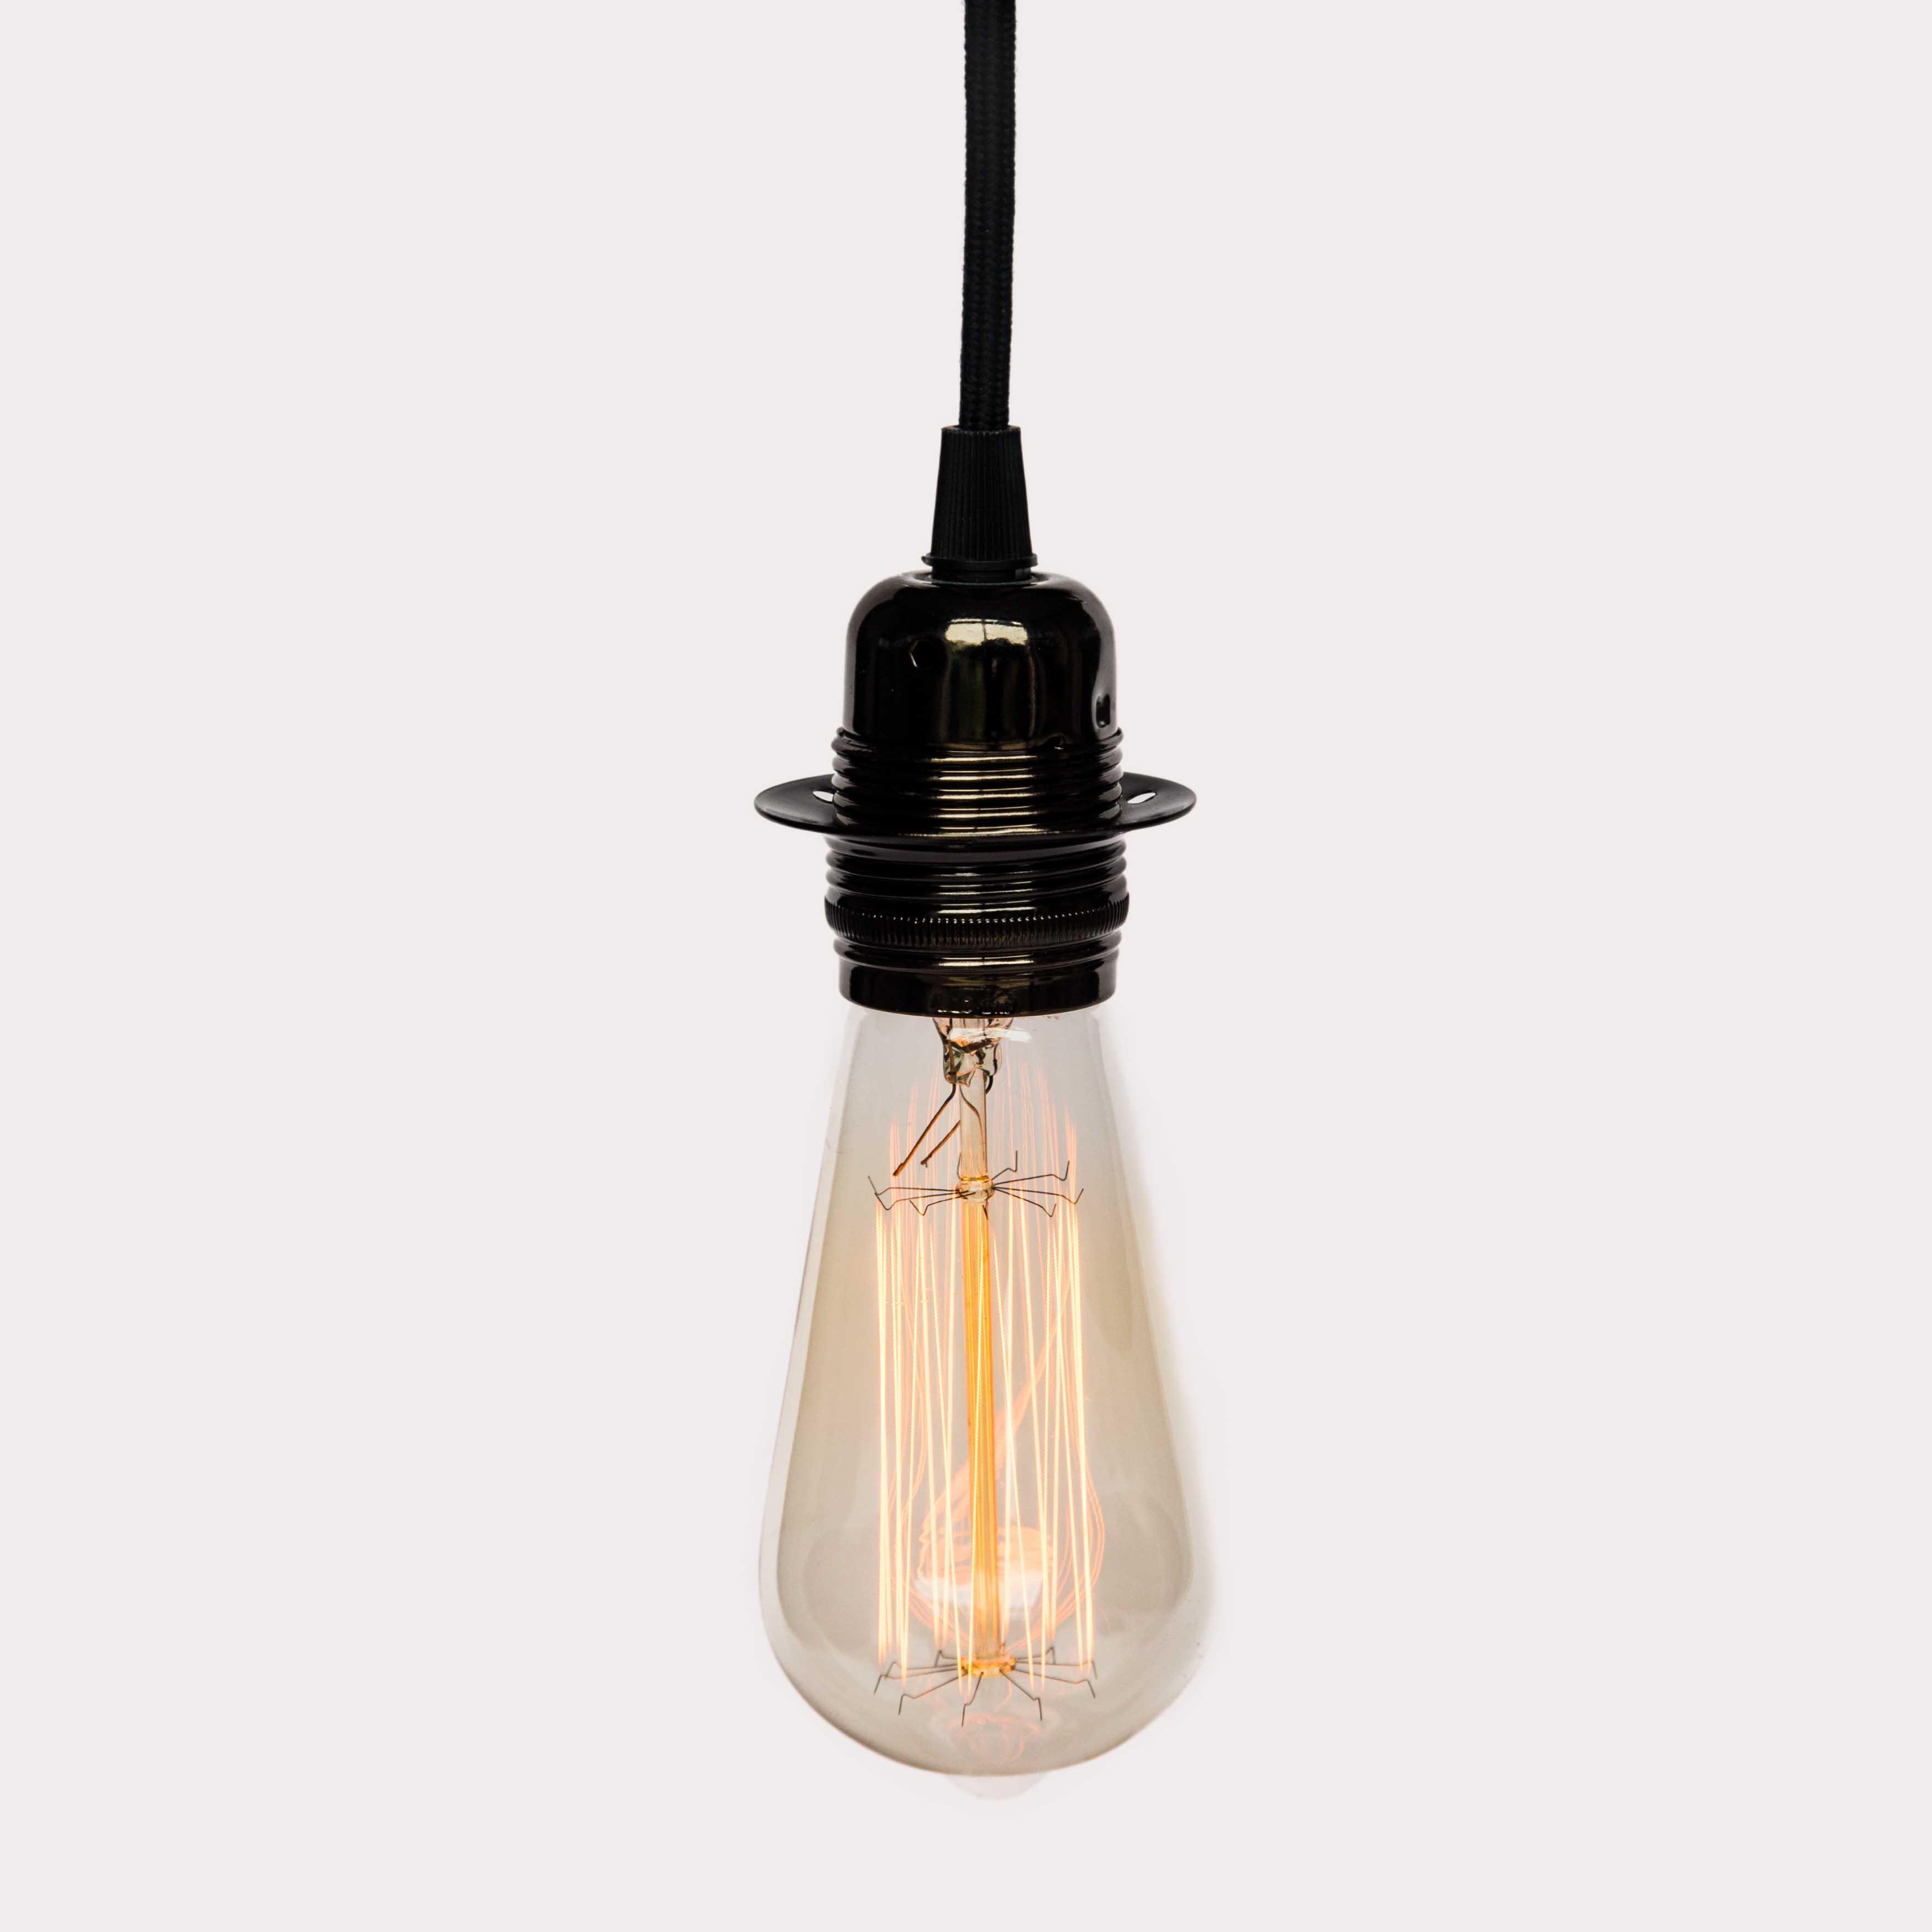 Teardrop st64 william and watson vintage edison bulb industrial light - St64 Teardrop Large William And Watson Industrial Vintage Retro Edison Light Bulb White Low Rez